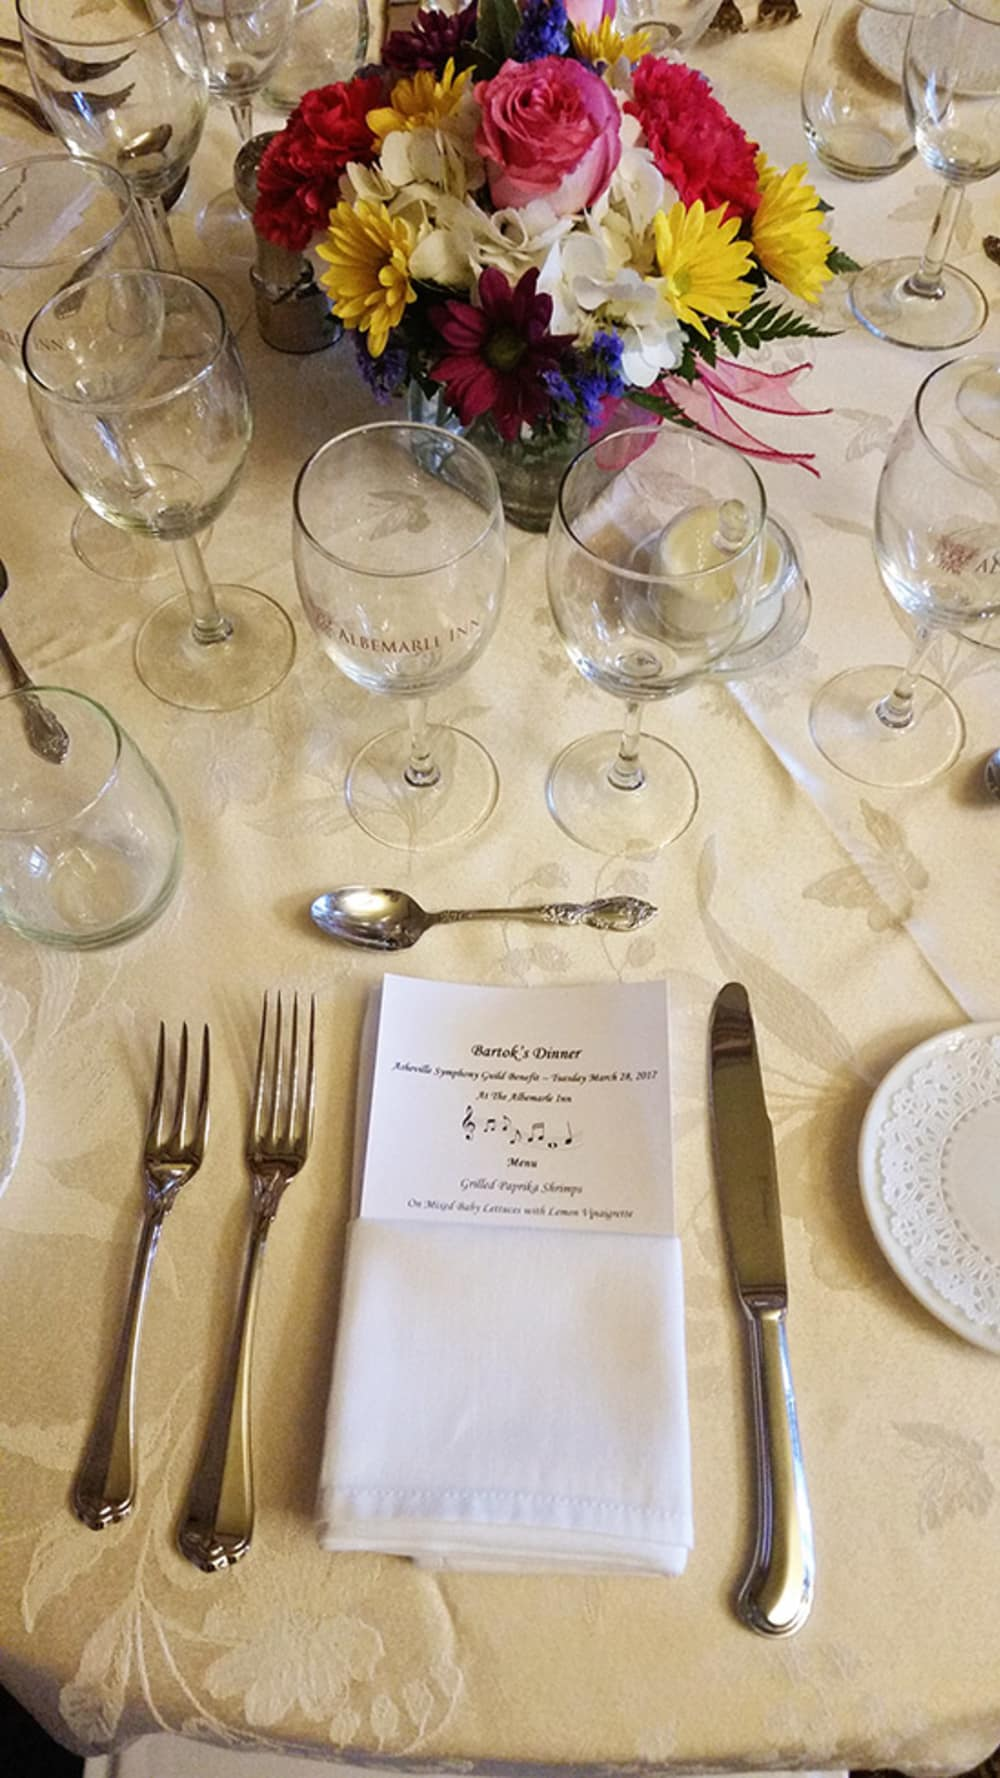 Bartok's Symphony Dinner